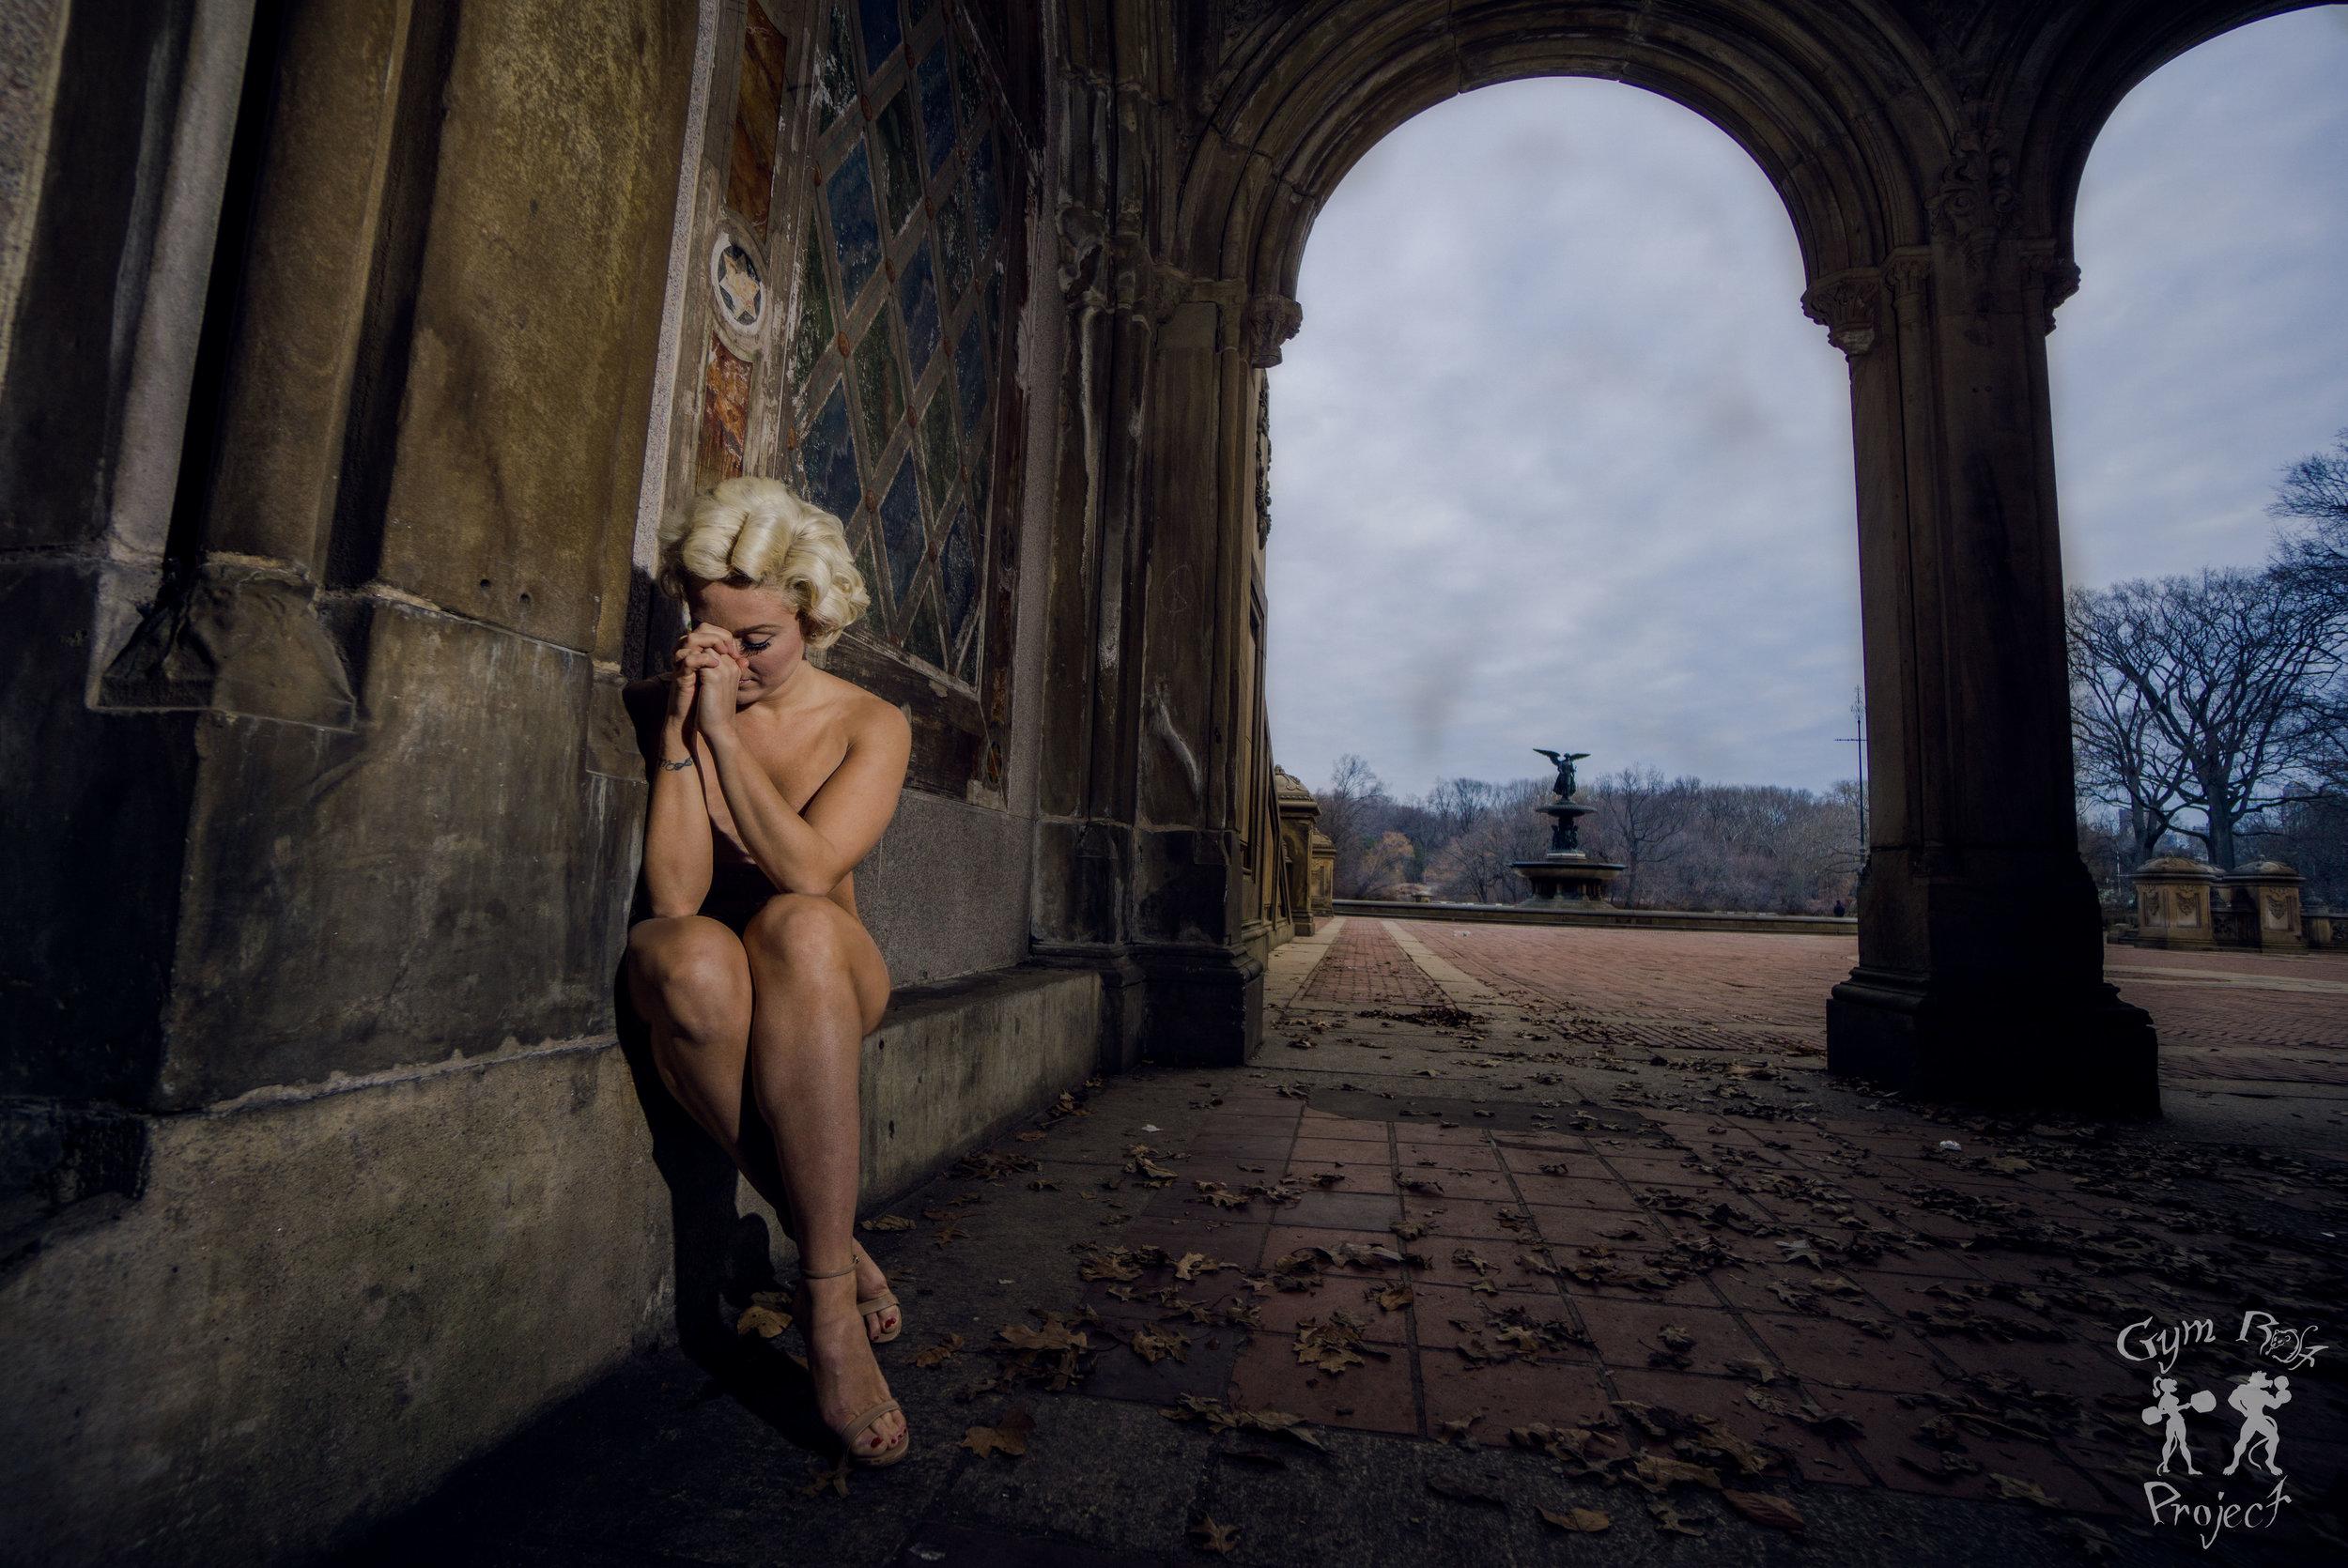 vickygood-photography-gym-rat-project-olivia